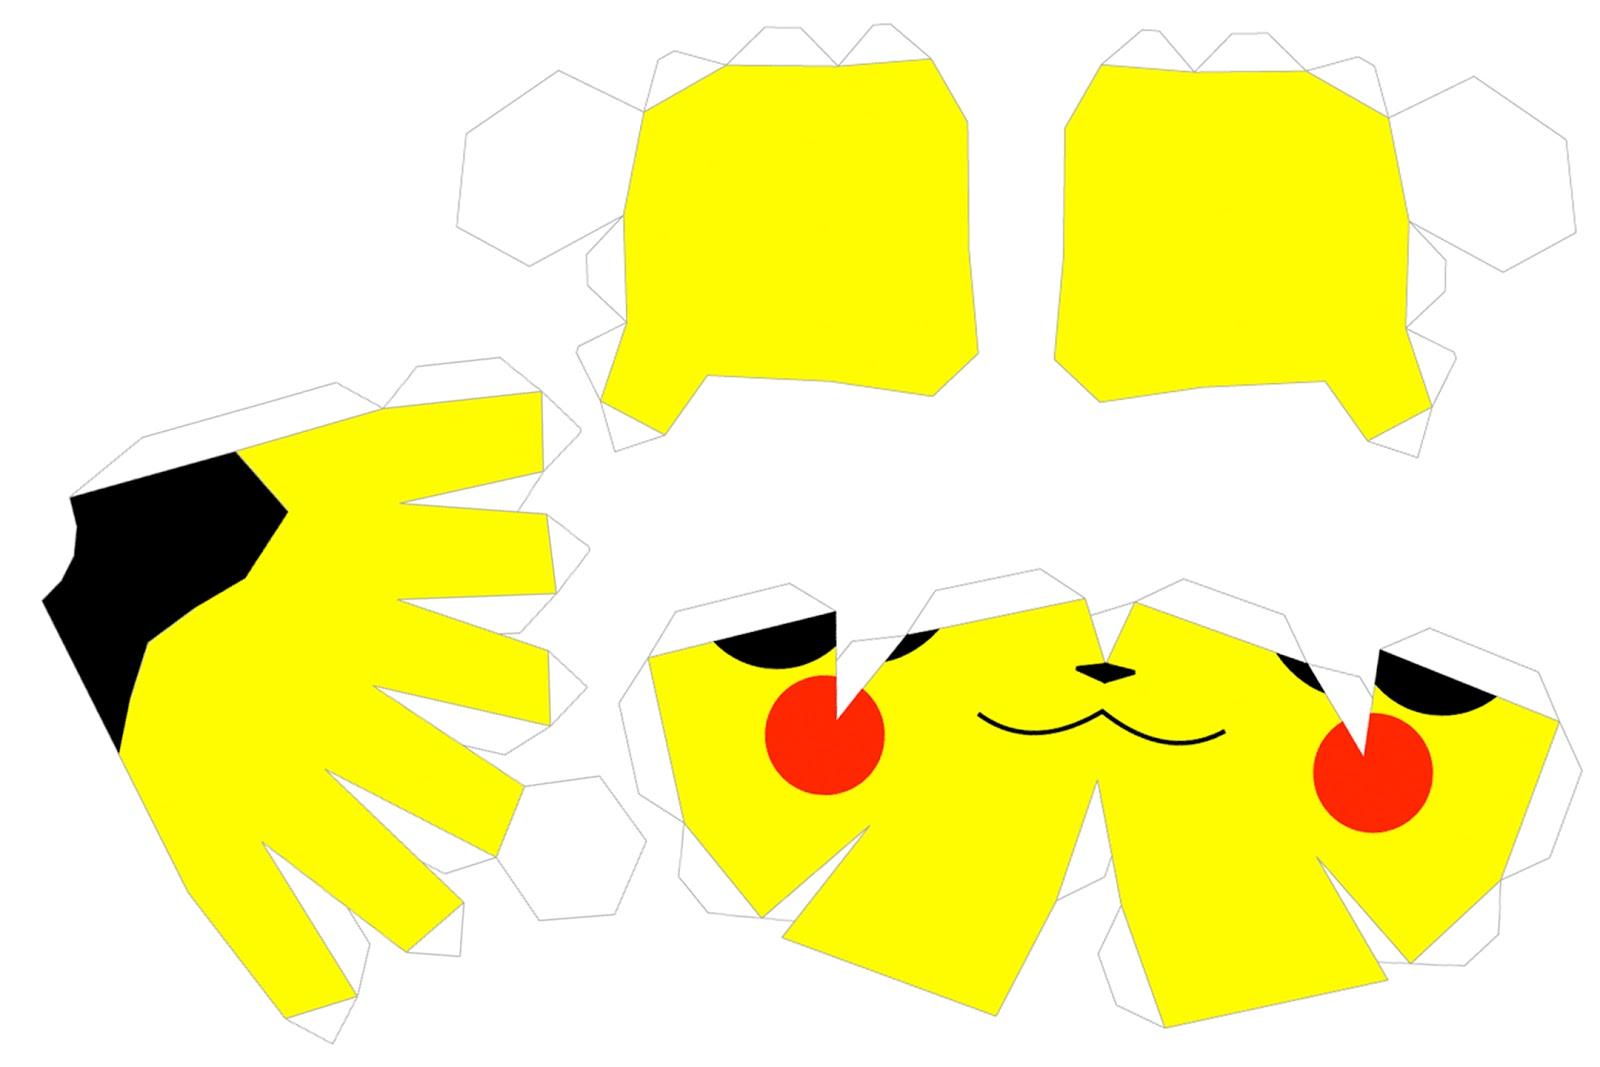 Quirky artist loft free pattern pikachu pronofoot35fo Gallery